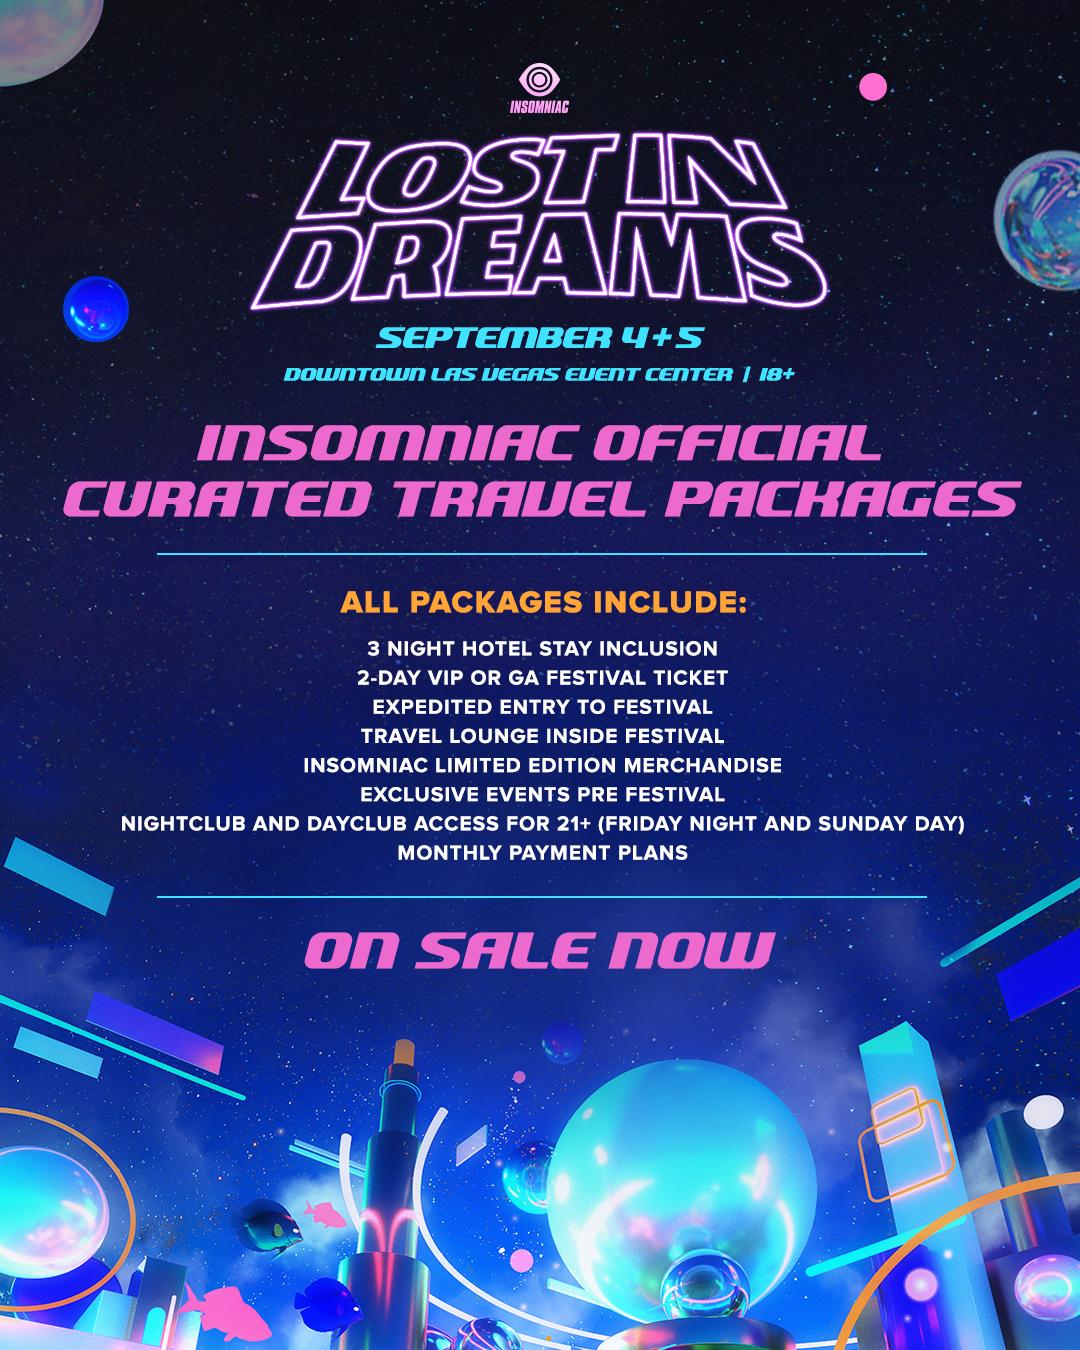 lost in dreams hotel packages